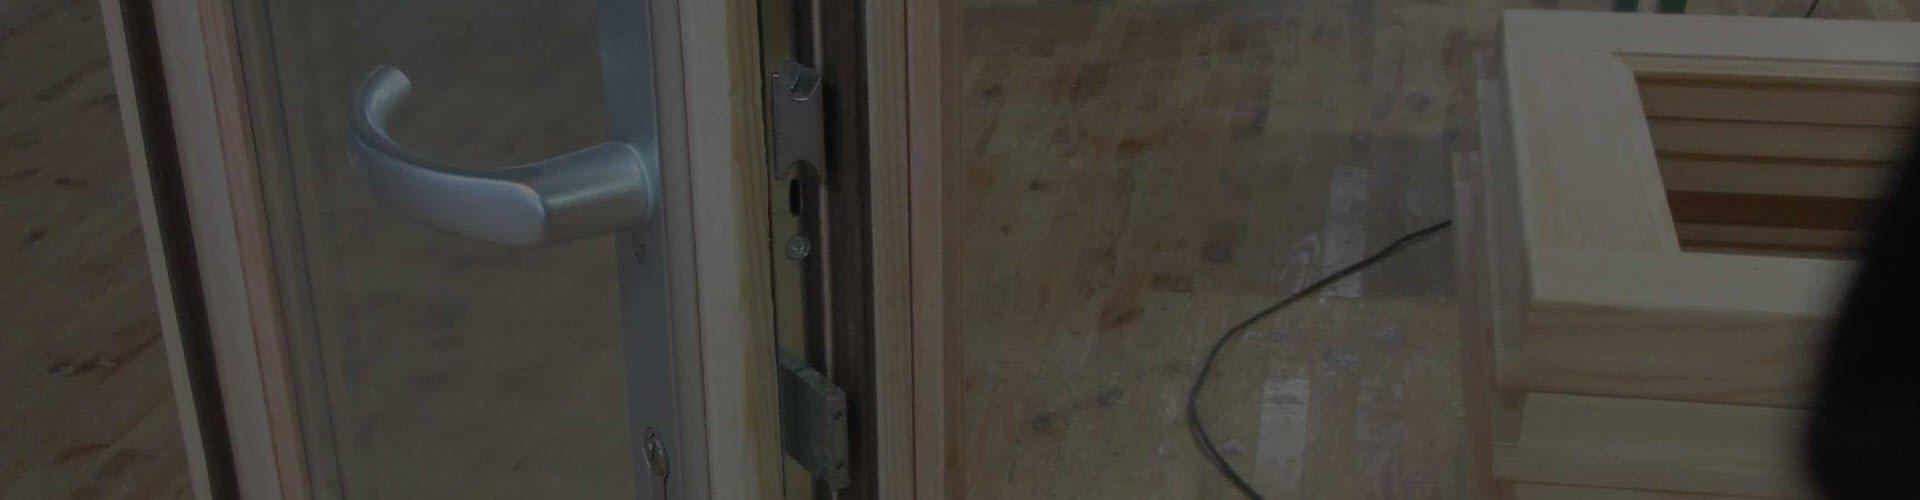 Log Cabins - Windows - Doors - Security